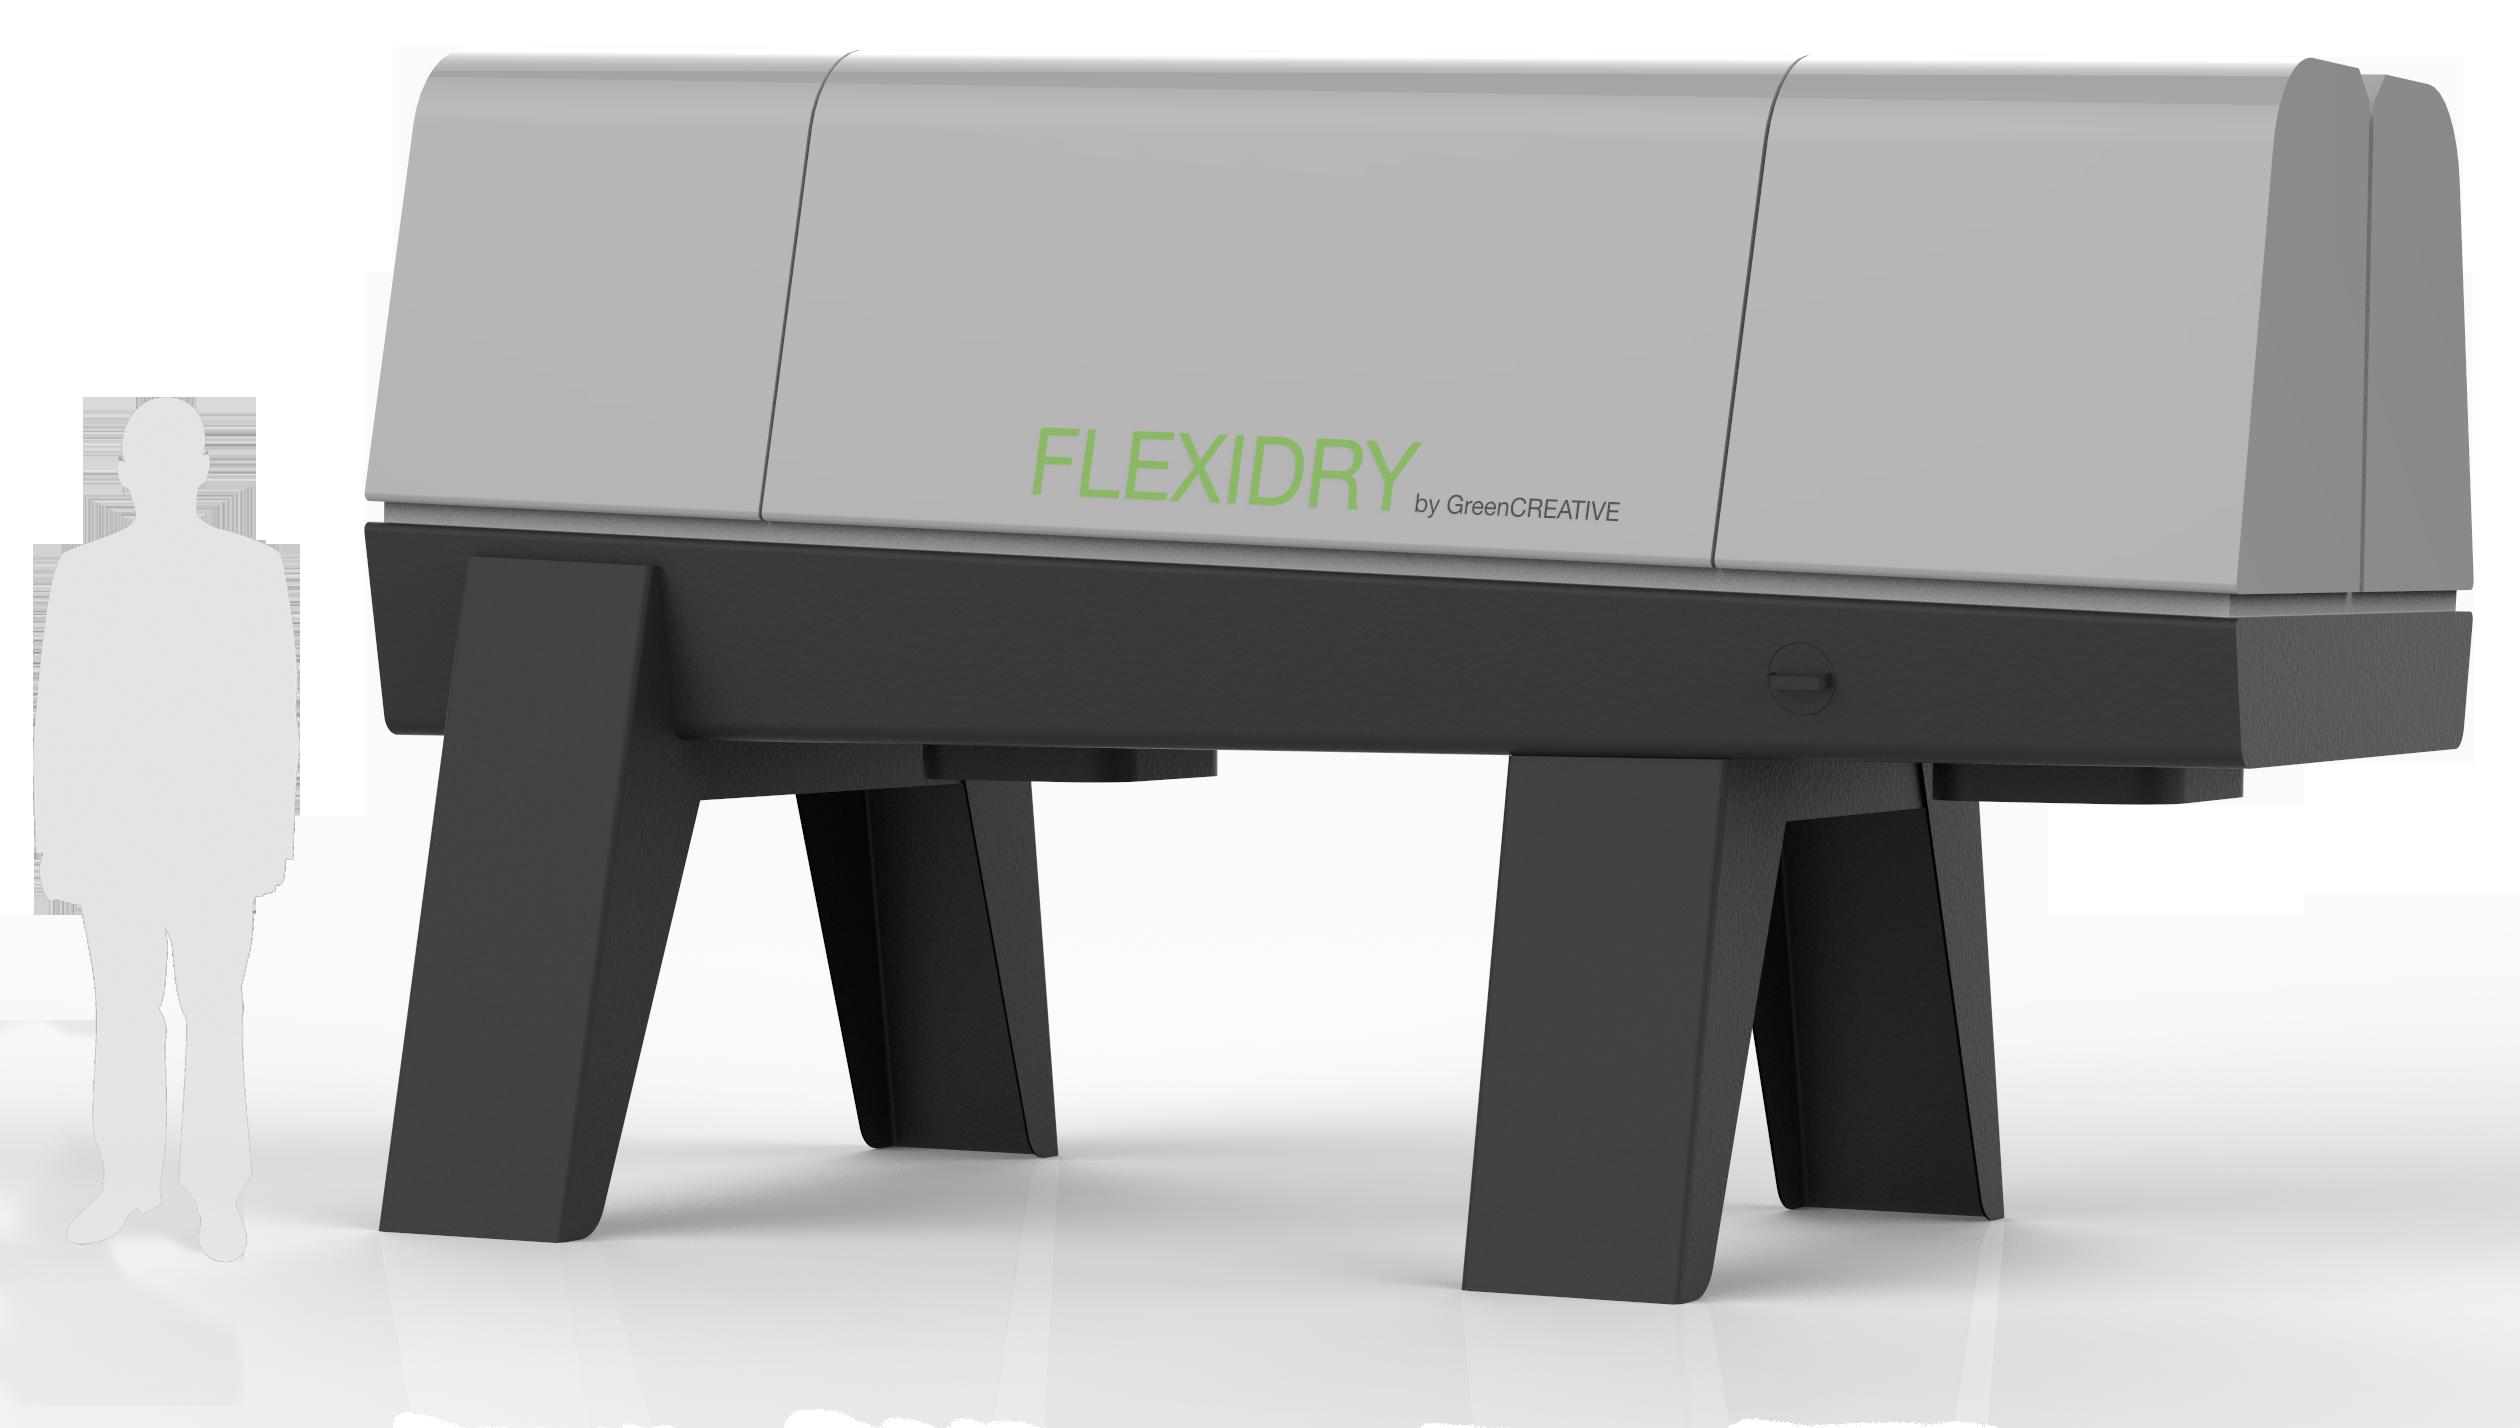 Flexidry